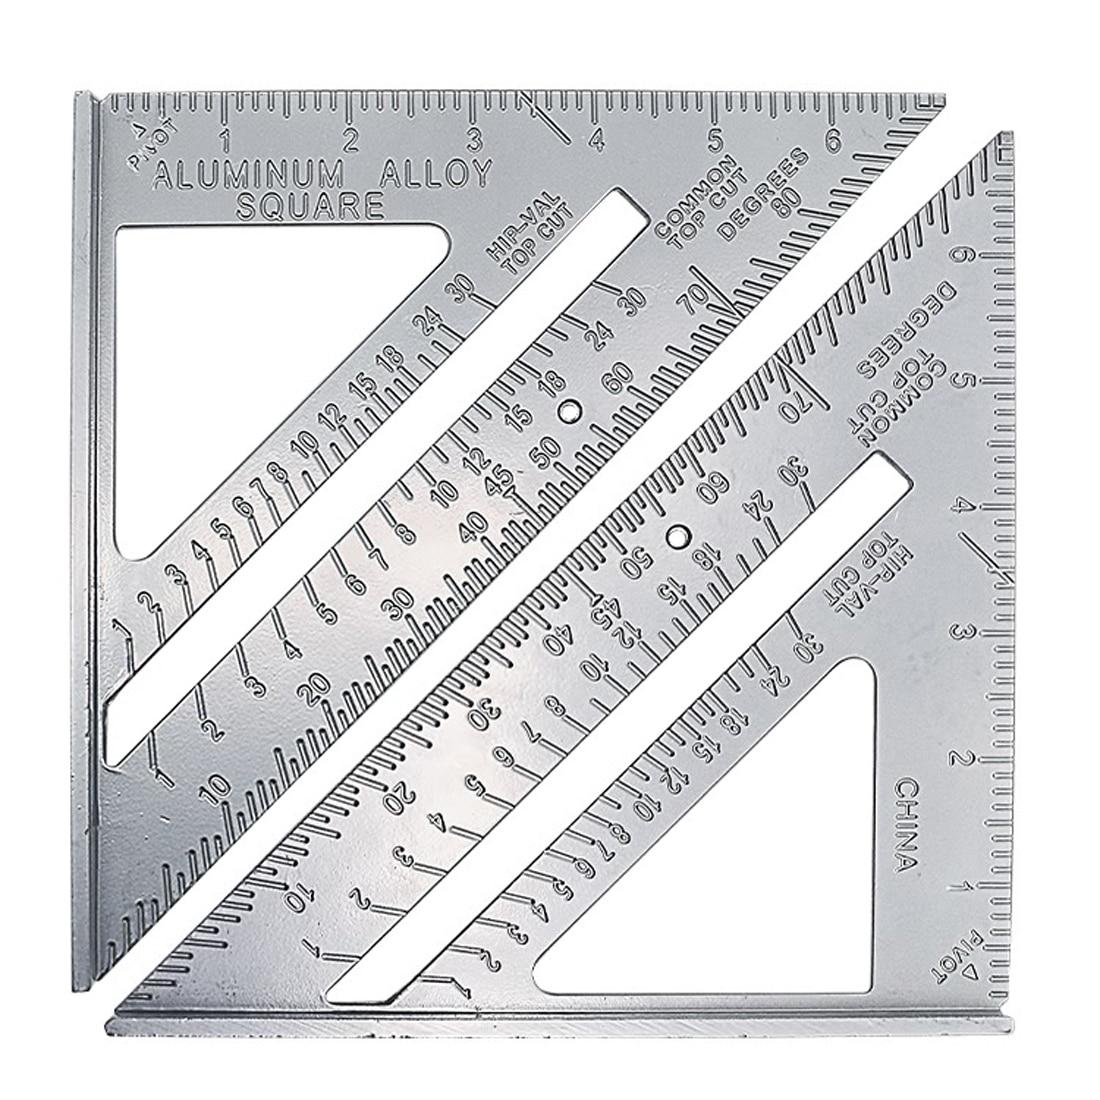 Hot Square Protractor Aluminum Alloy Miter Framing Tri-square Line Scriber Saw Guide Measurement Inch Carpenter Ruler Dropship aluminum alloy t general pervez musharraf held hole hole crossed feet carpenter scriber